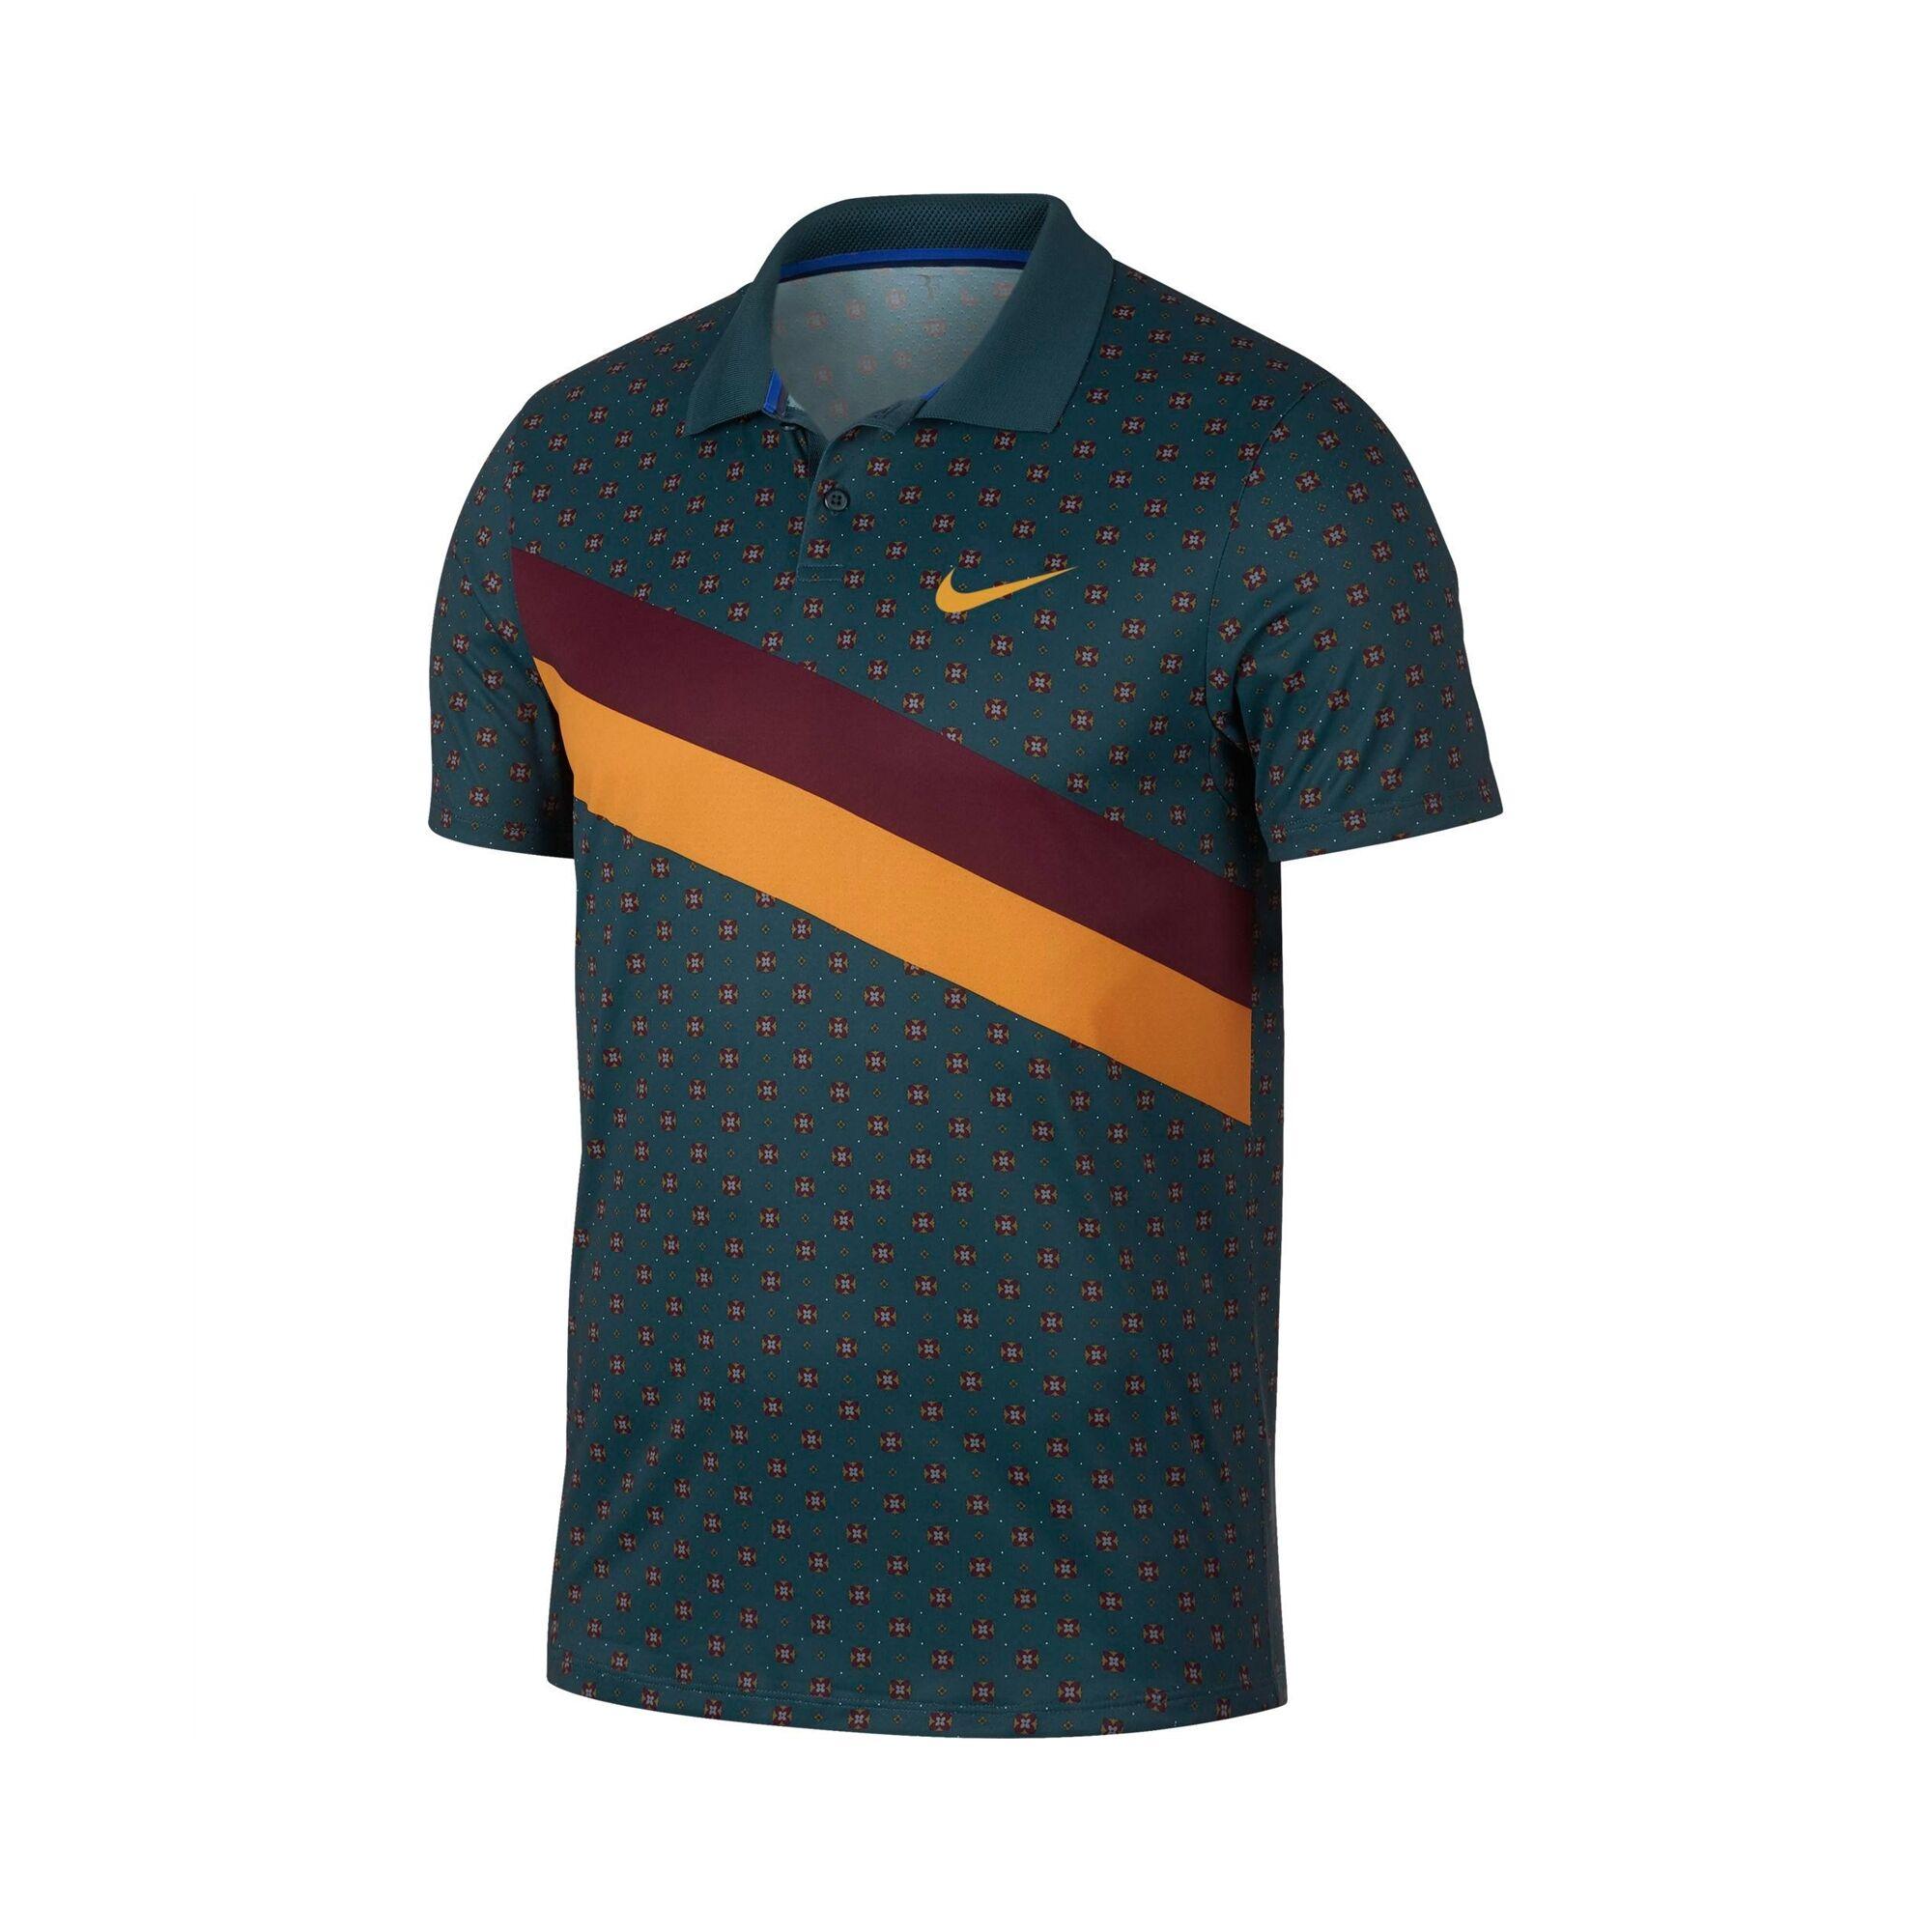 Nike Dri-Fit Polo Nightshade/Canyon Gold M